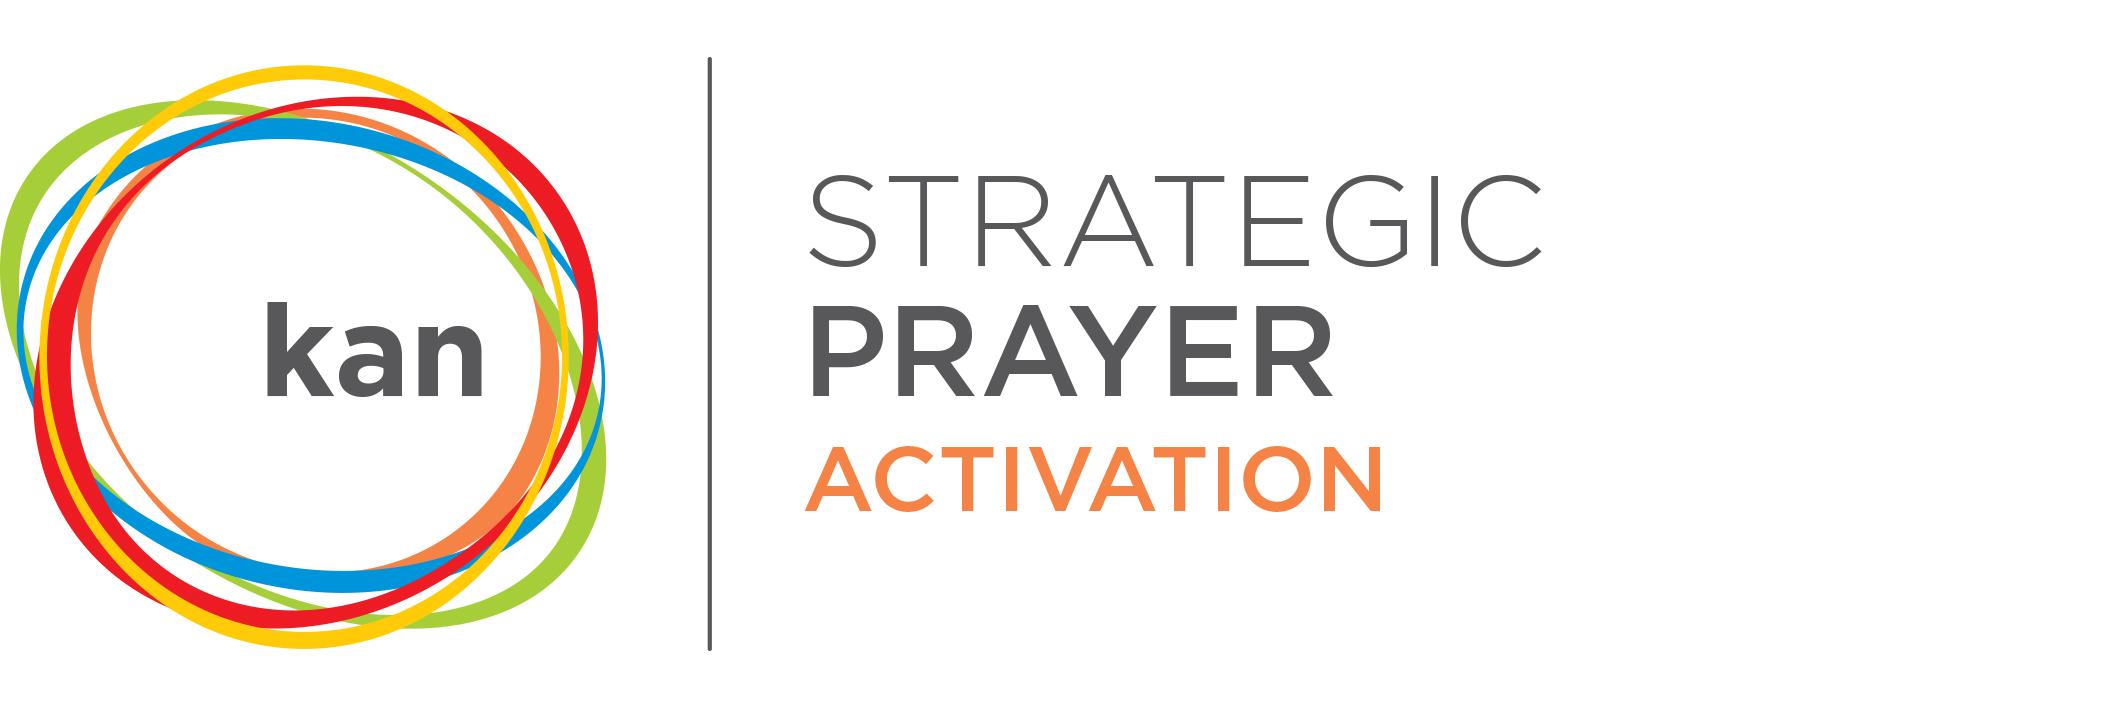 Strategic Prayer - Kingdom Advance Network